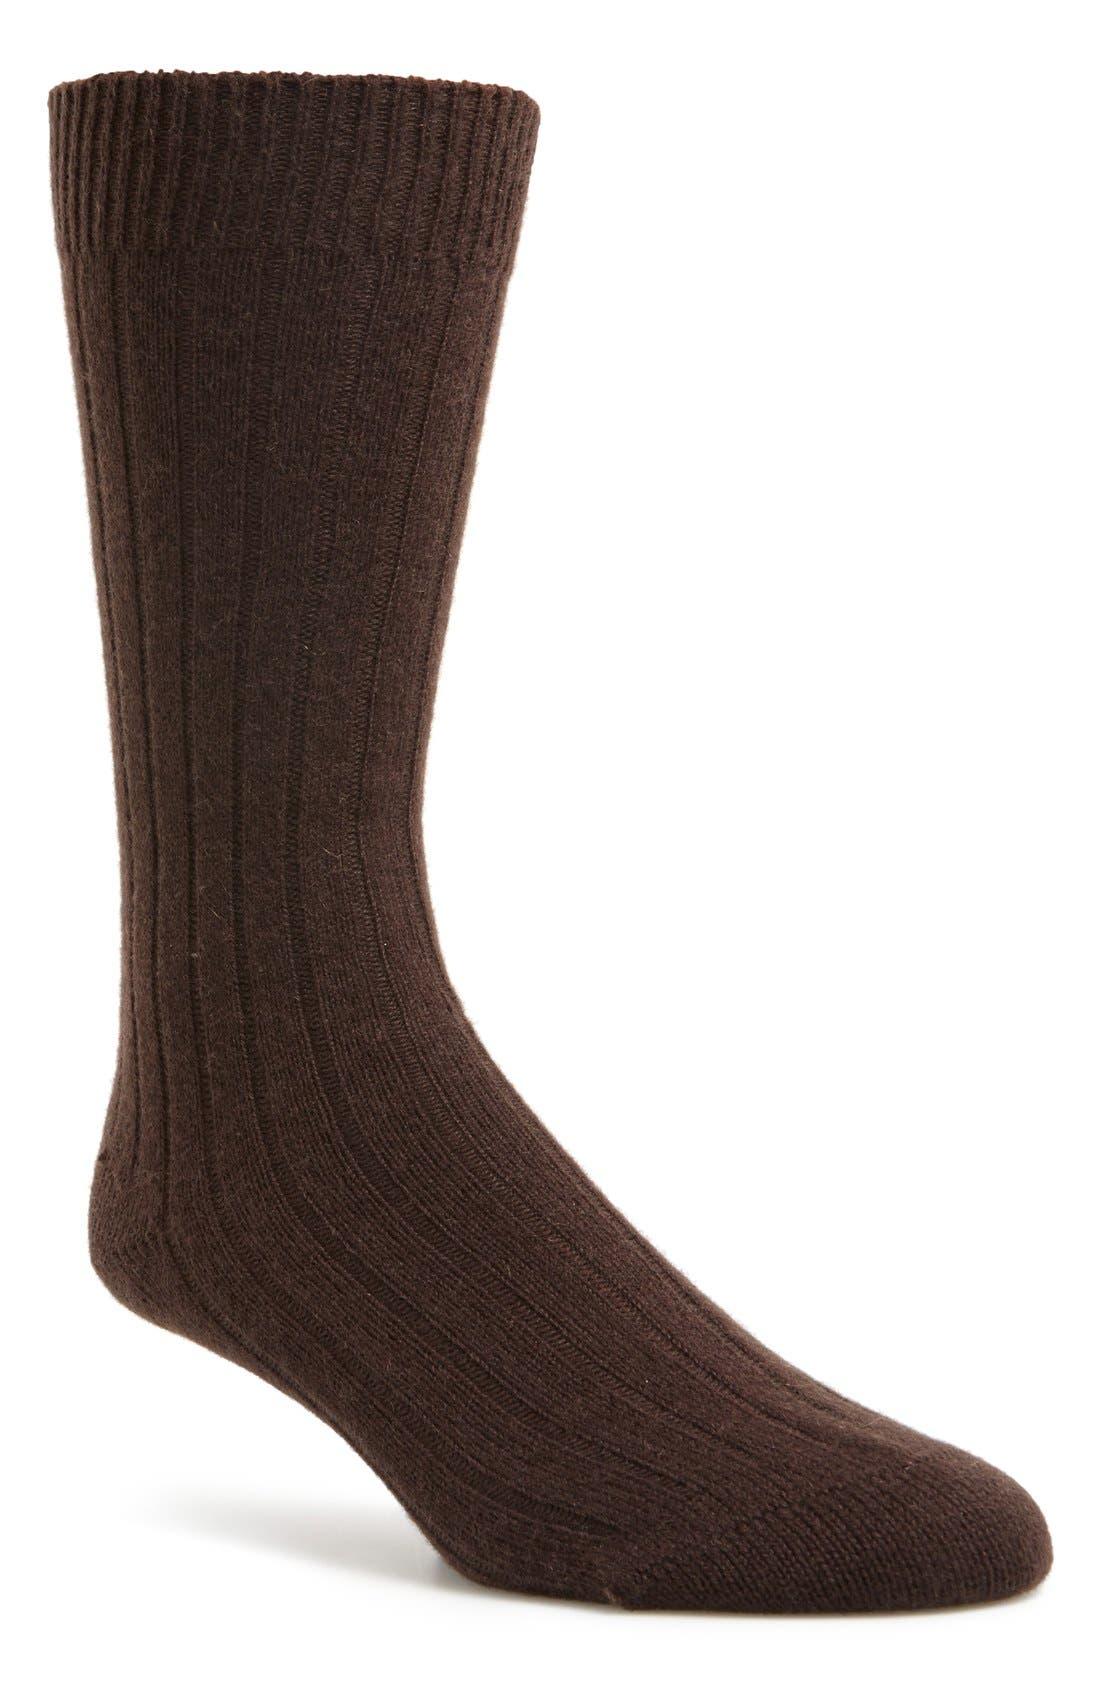 'Waddington' Cashmere Blend Mid Calf Socks,                             Main thumbnail 6, color,